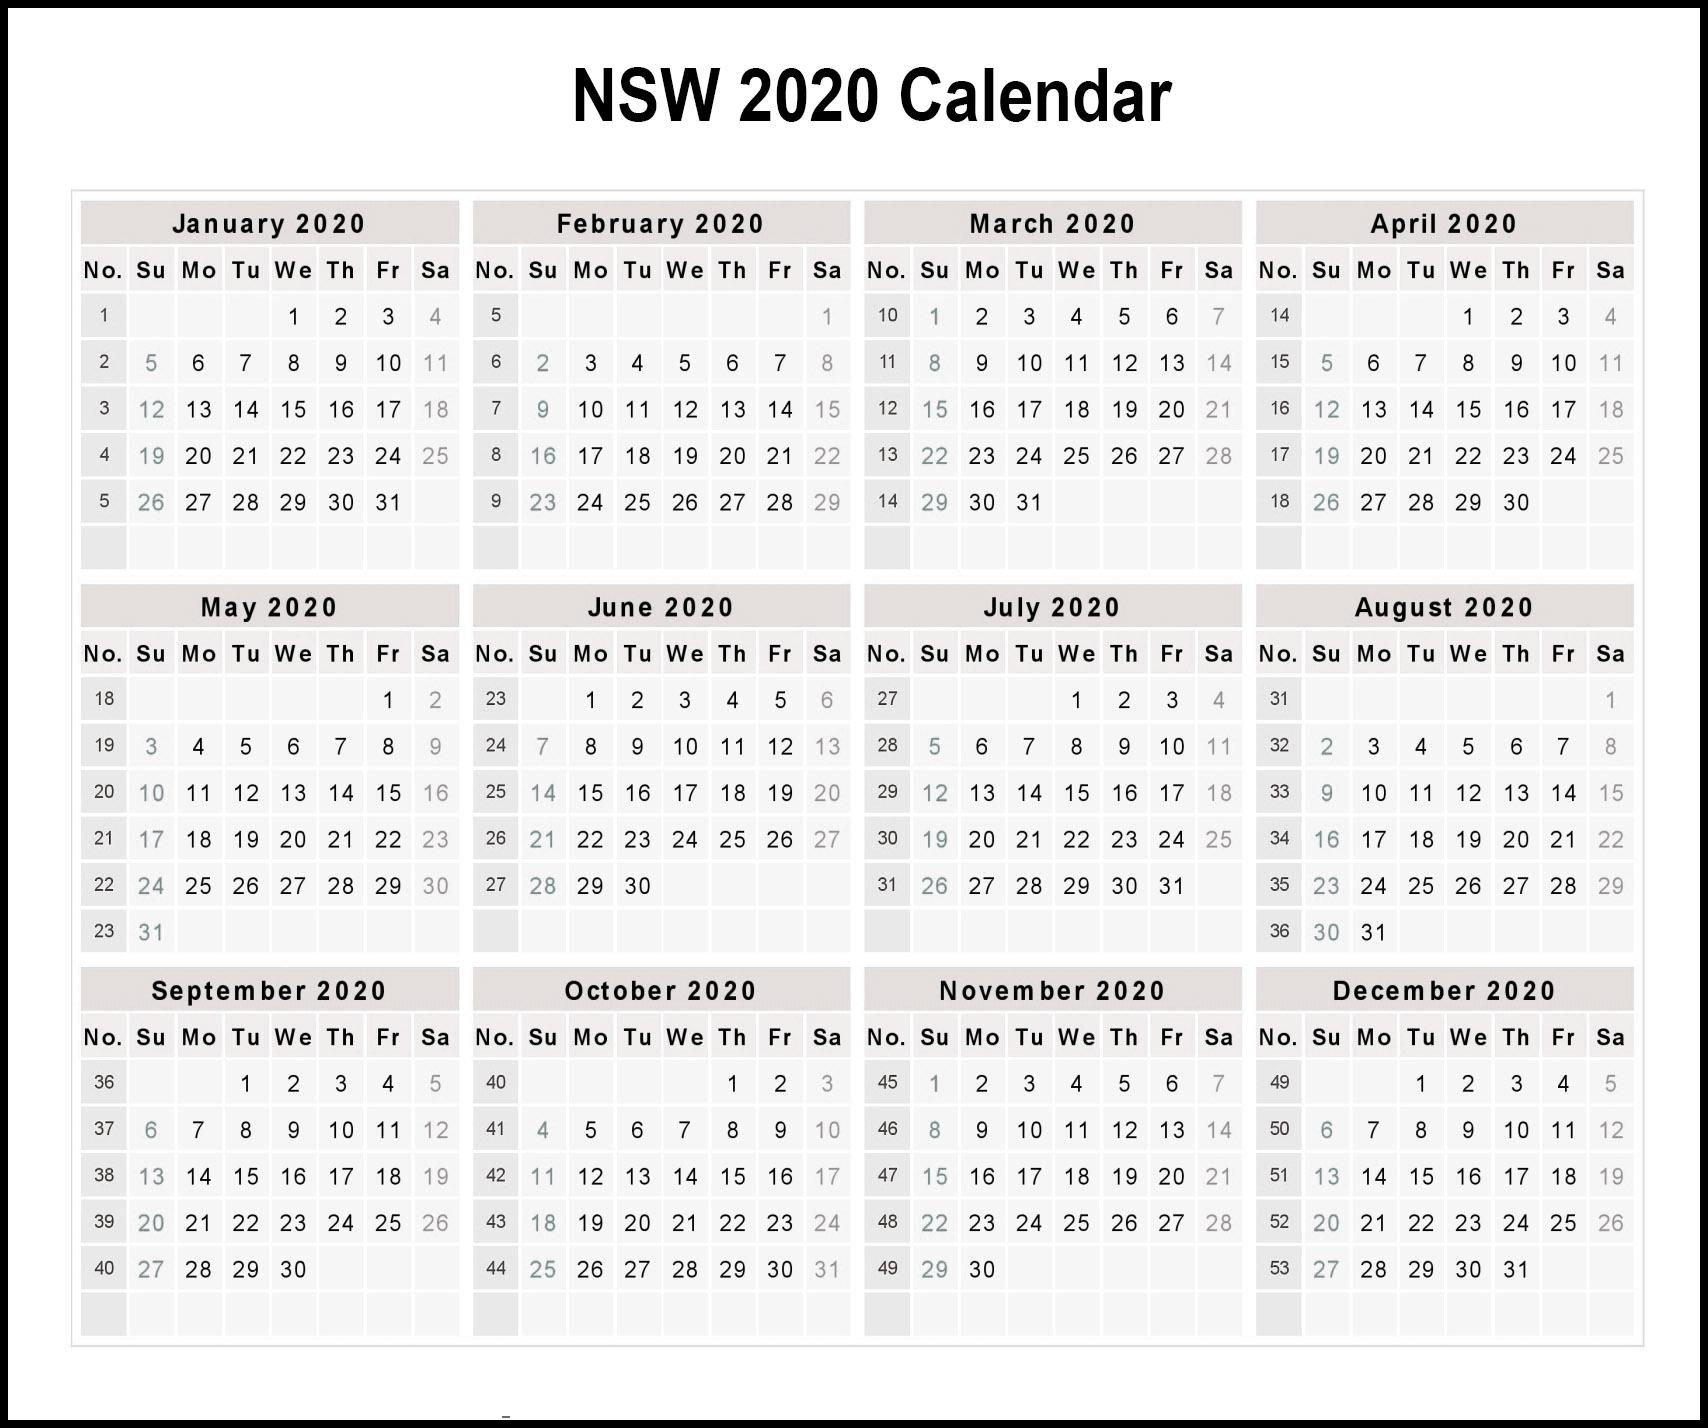 Calendar 2020 Templates With Nsw Holidays | Printable